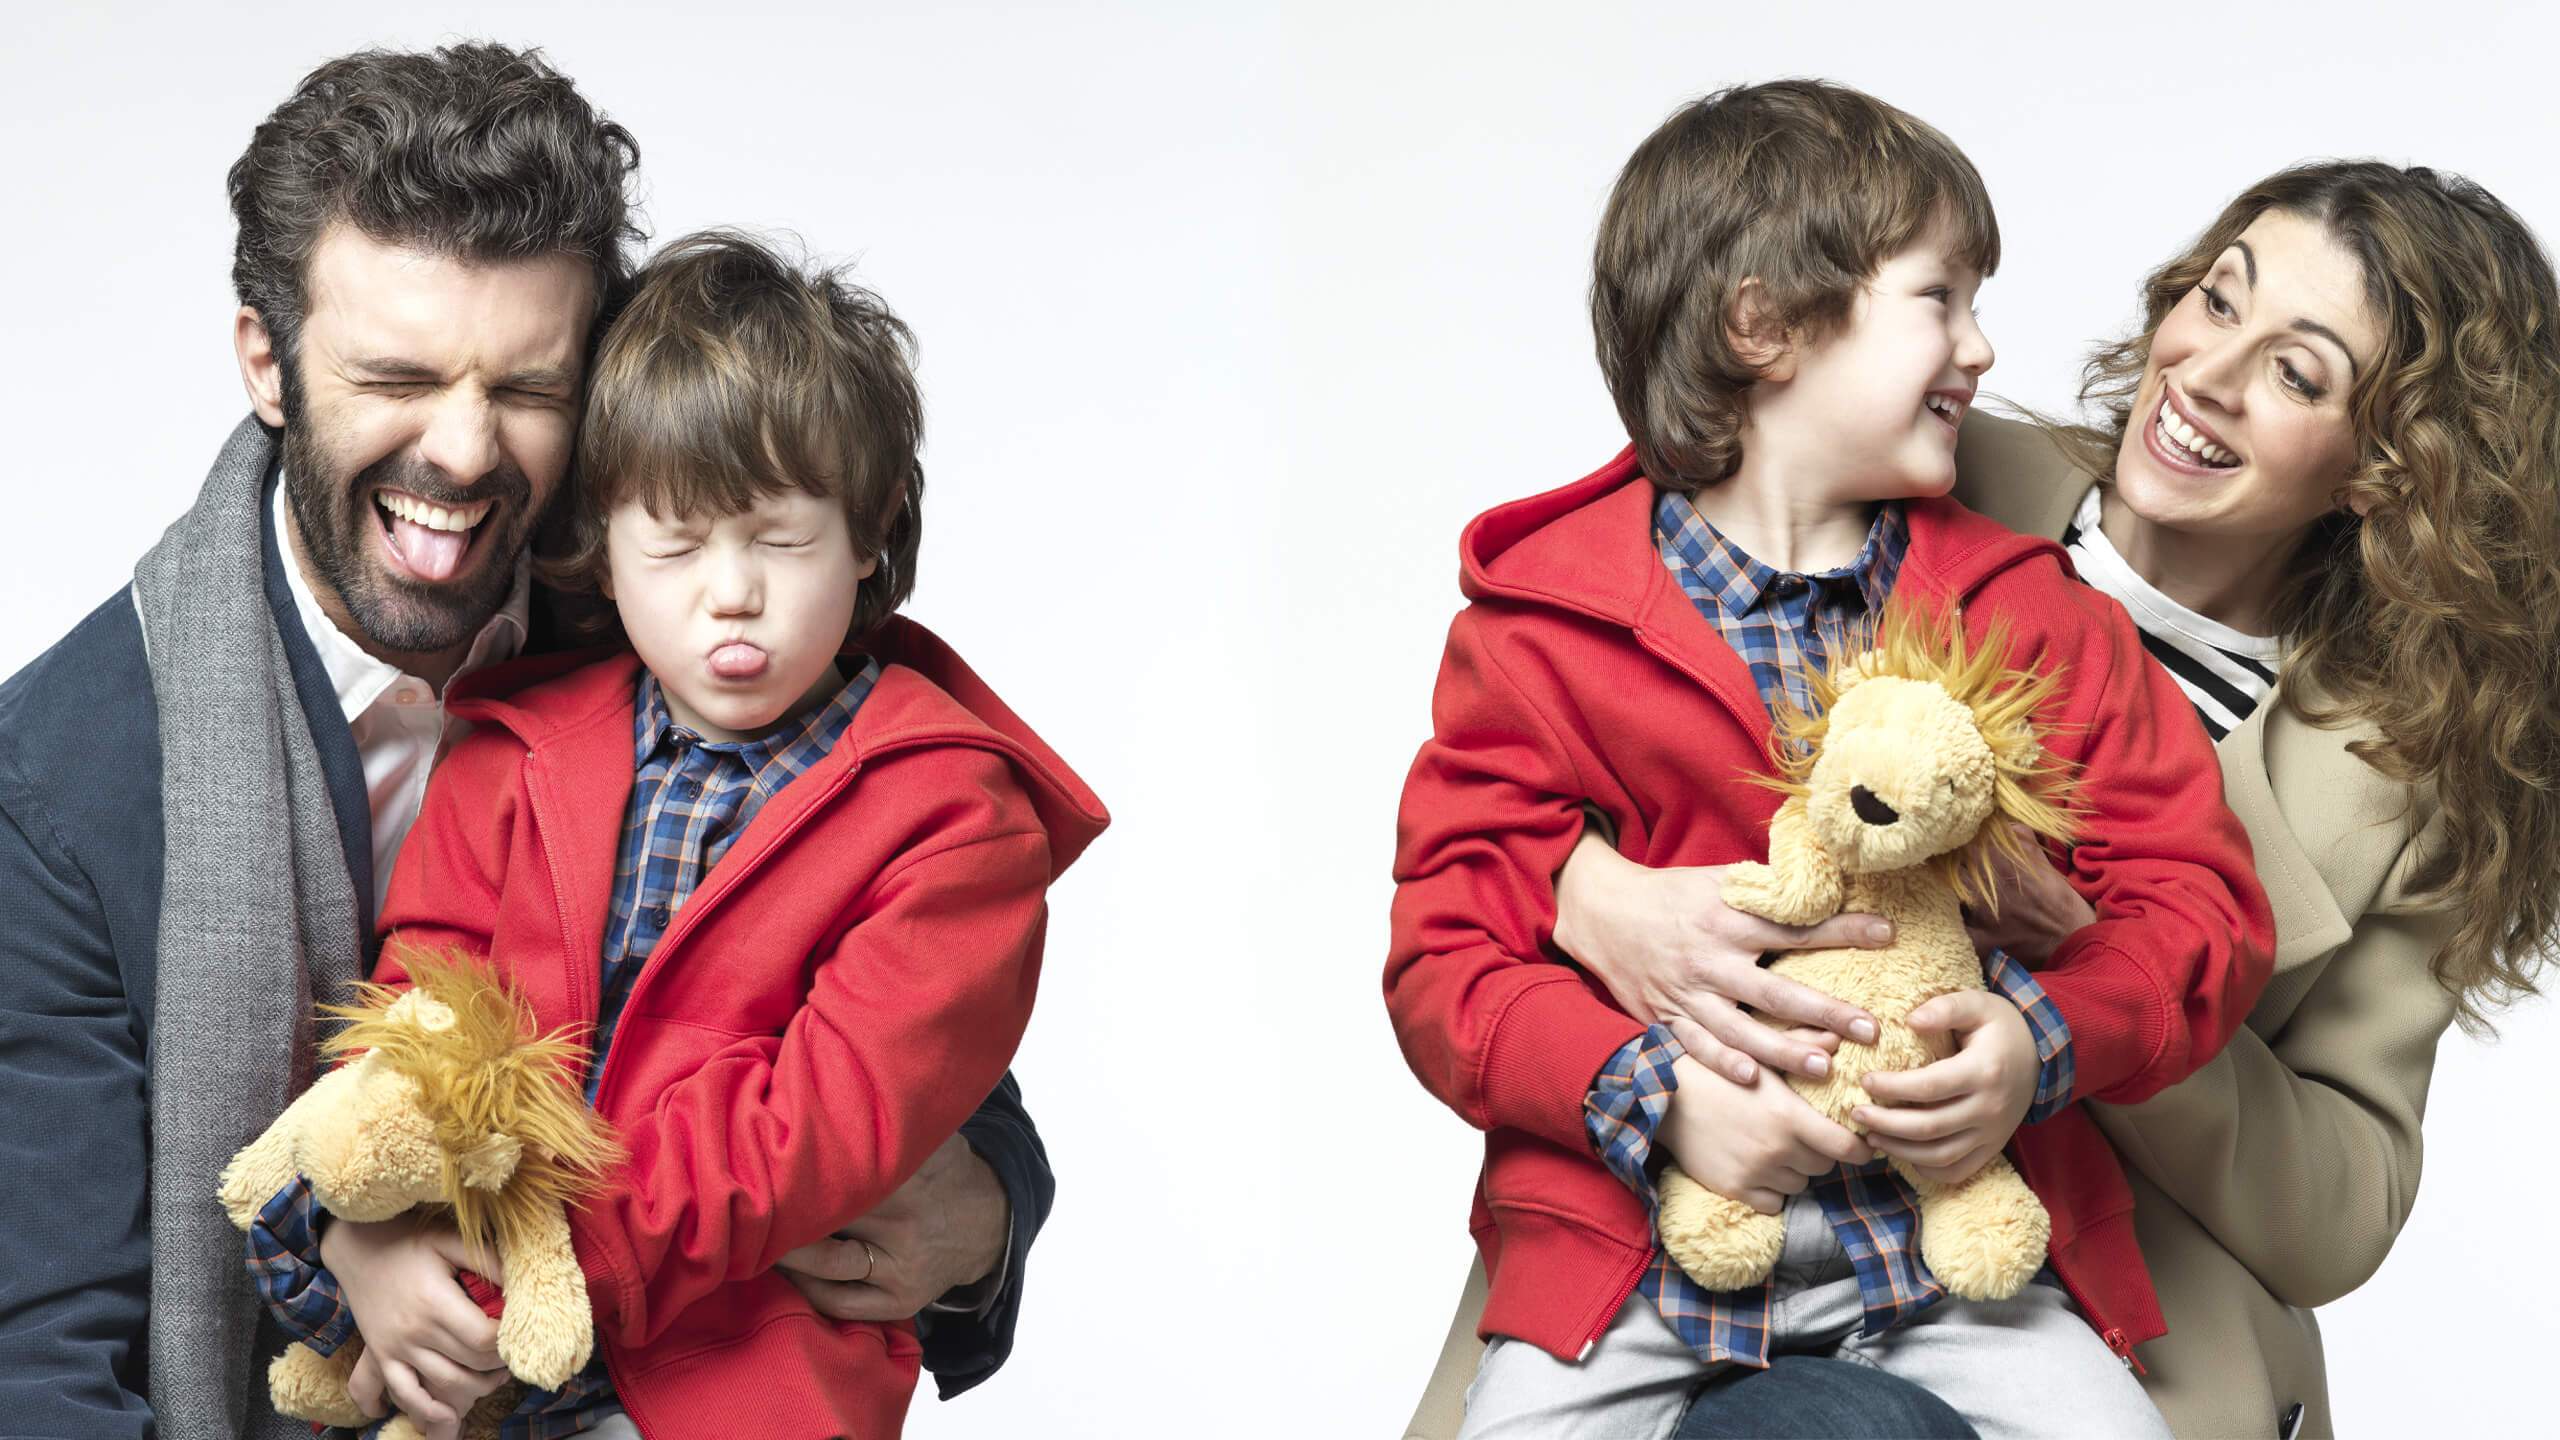 Scolari-Archivio-kids-13